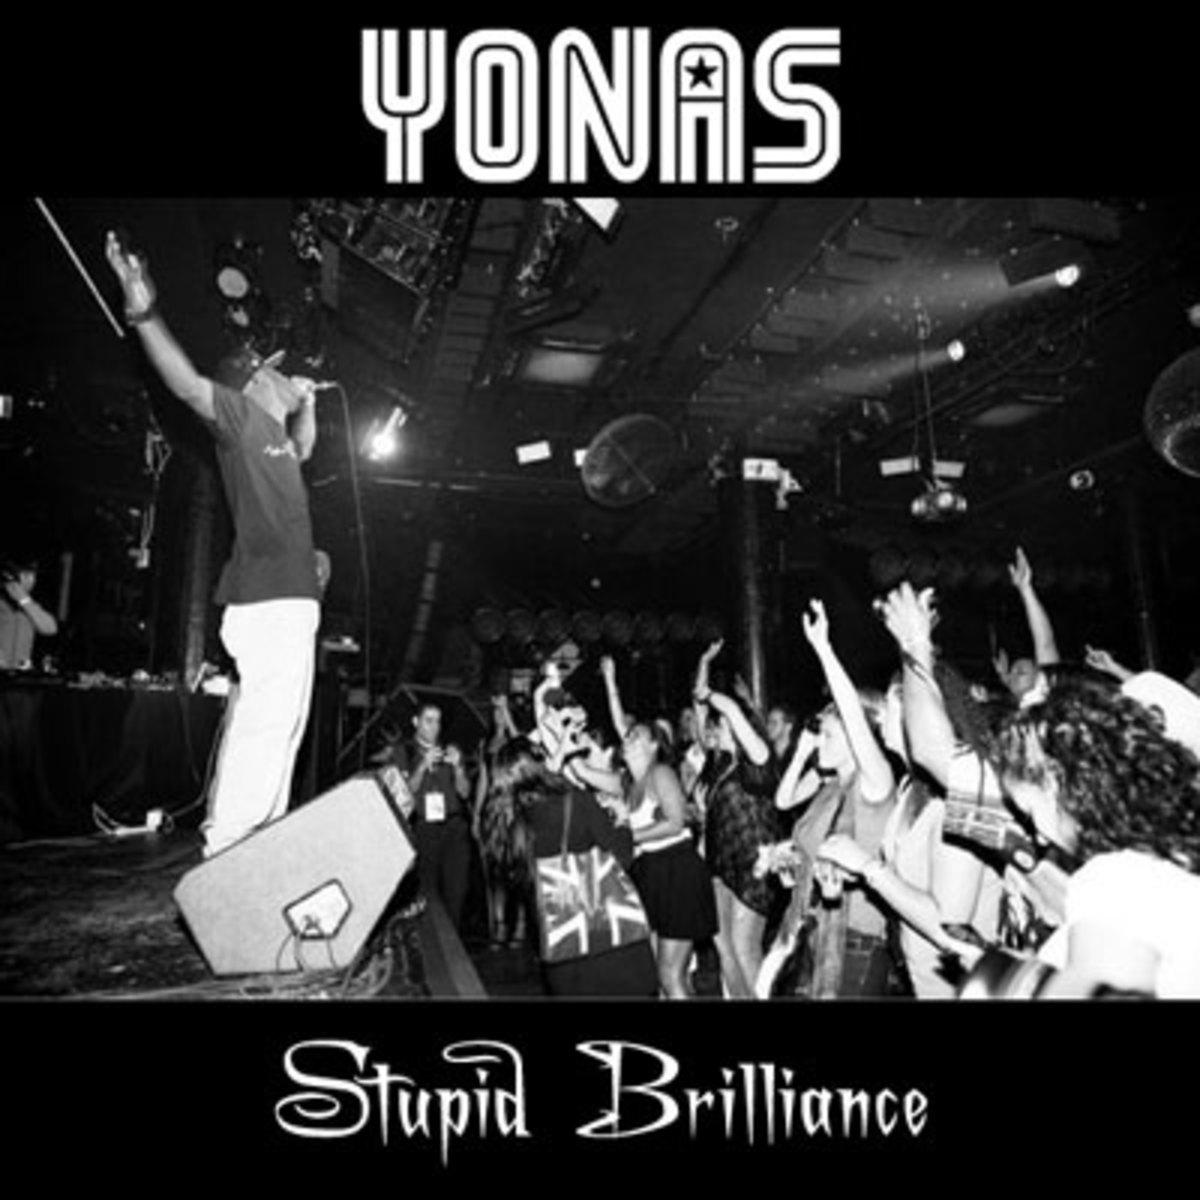 yonas-stupidbrilliance.jpg